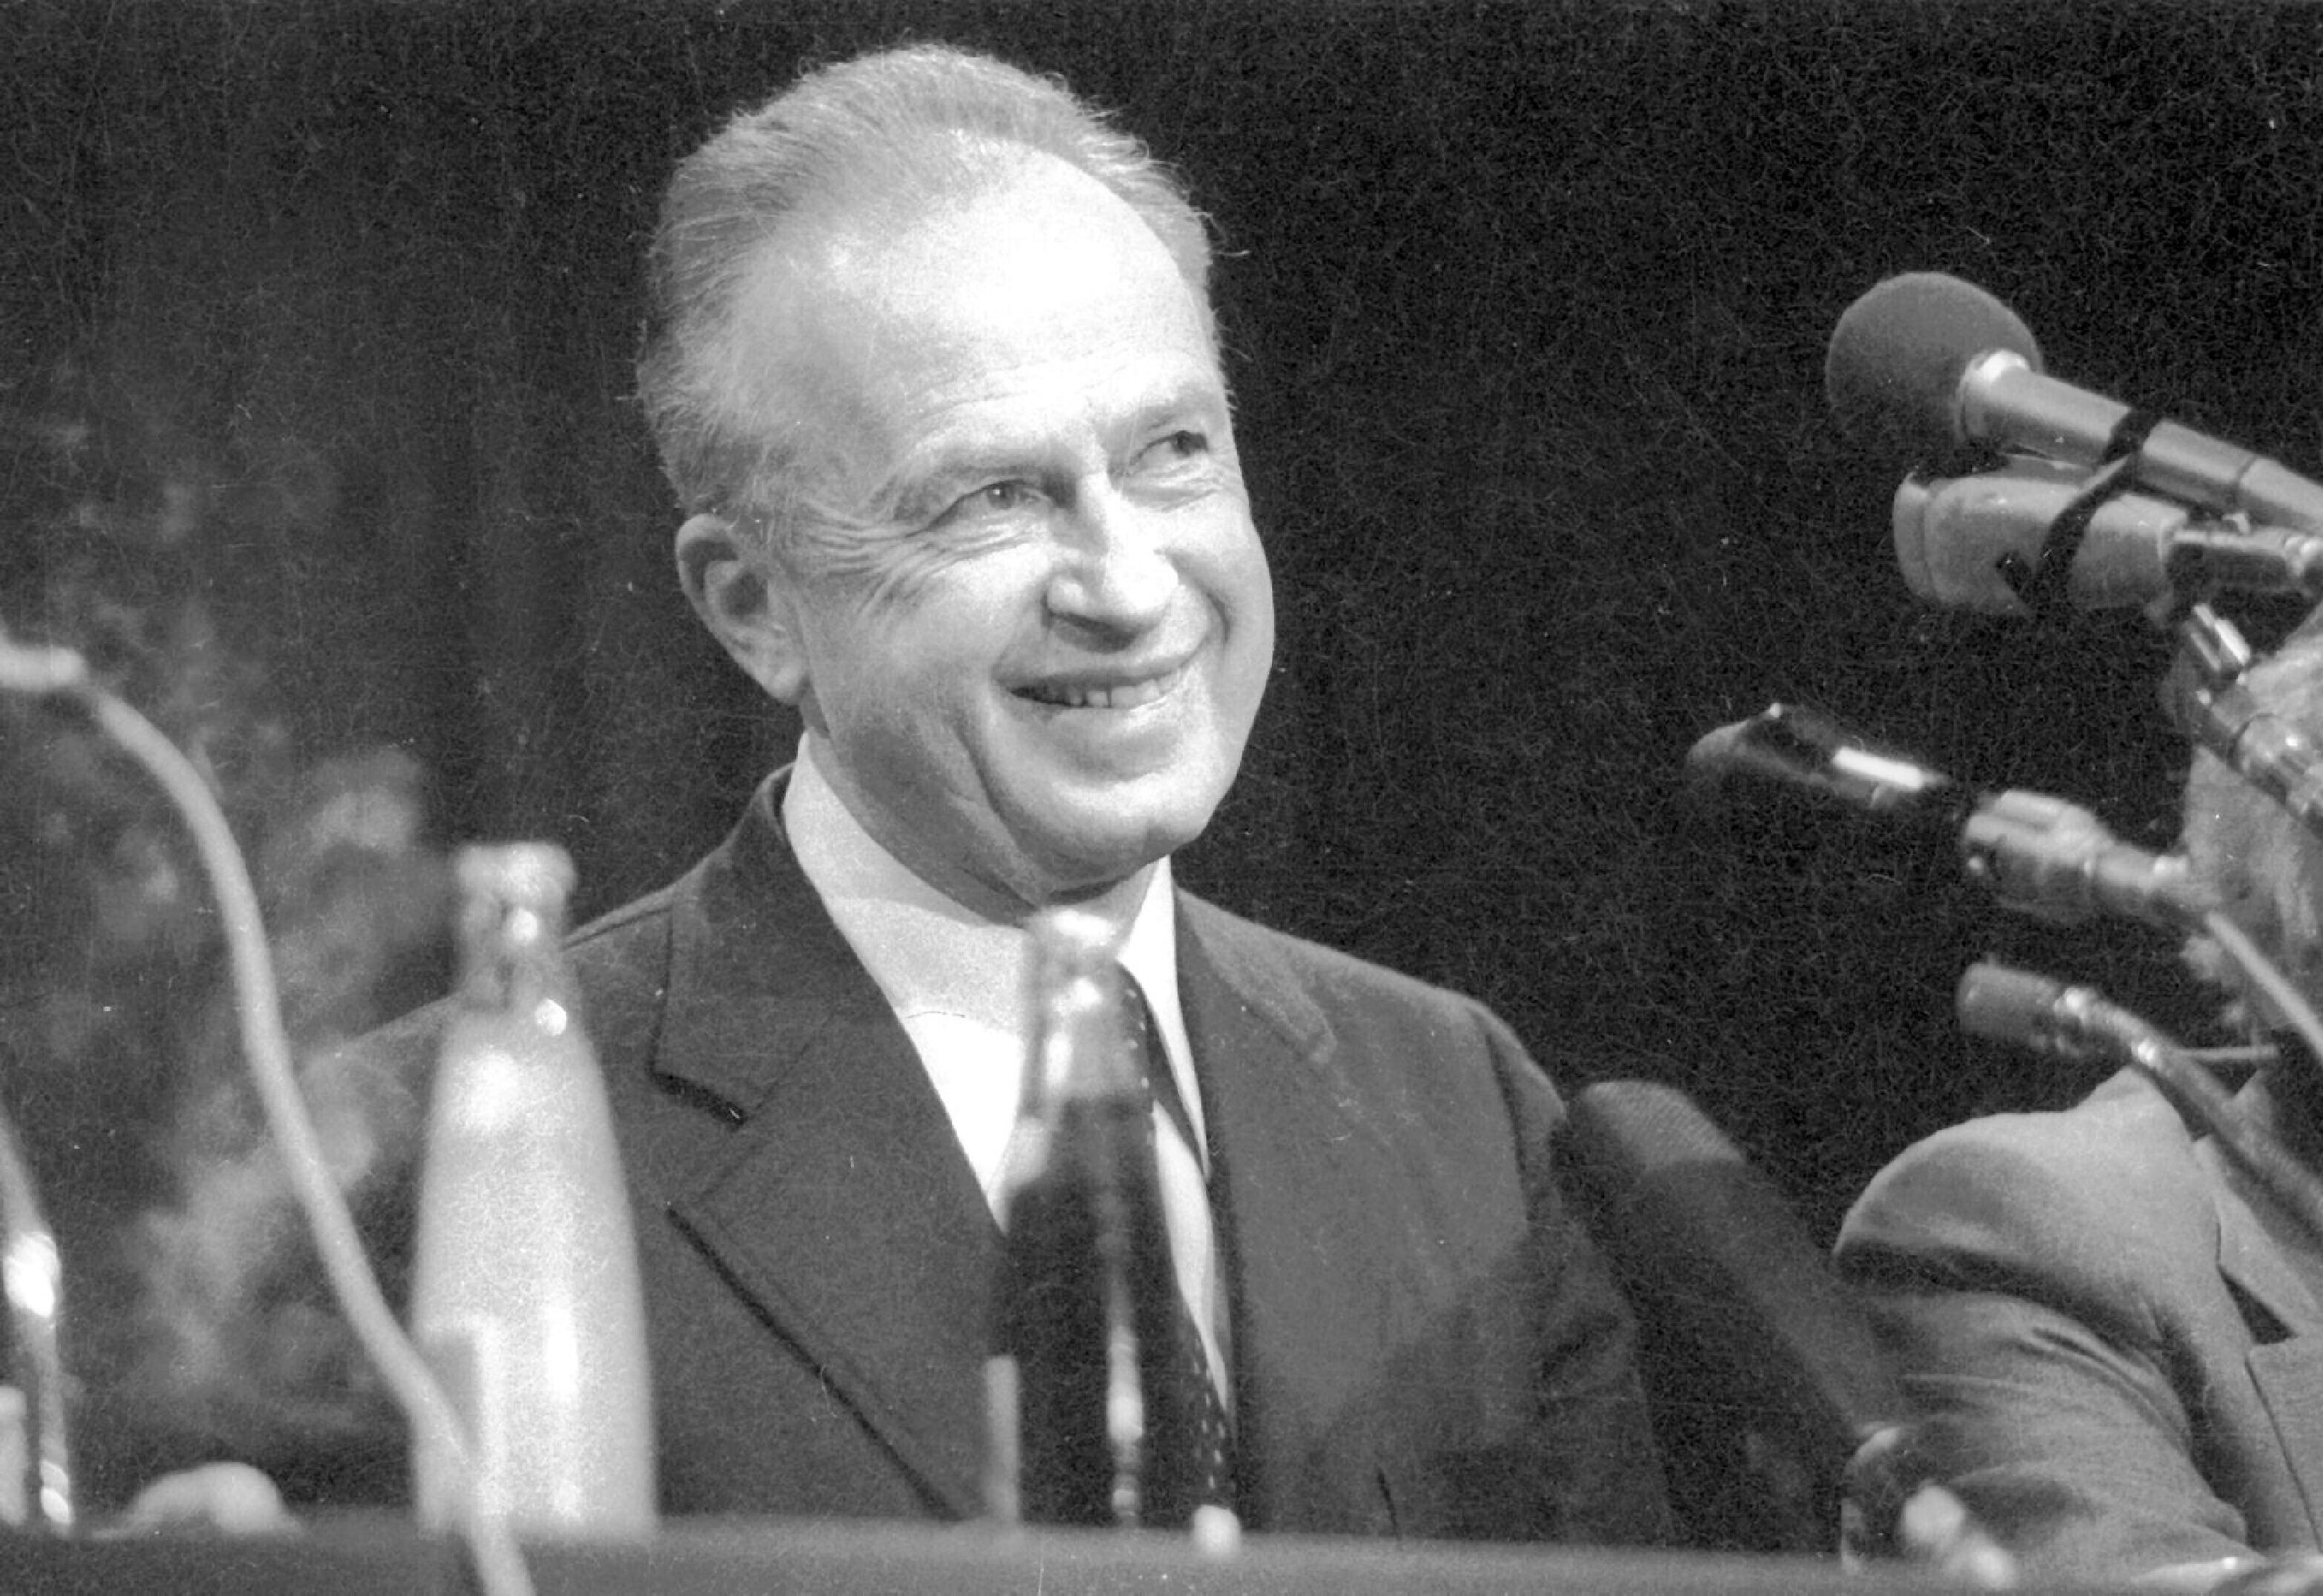 Yitzhak Rabin in 1978. (Yosi Rot/National Library of Israel)